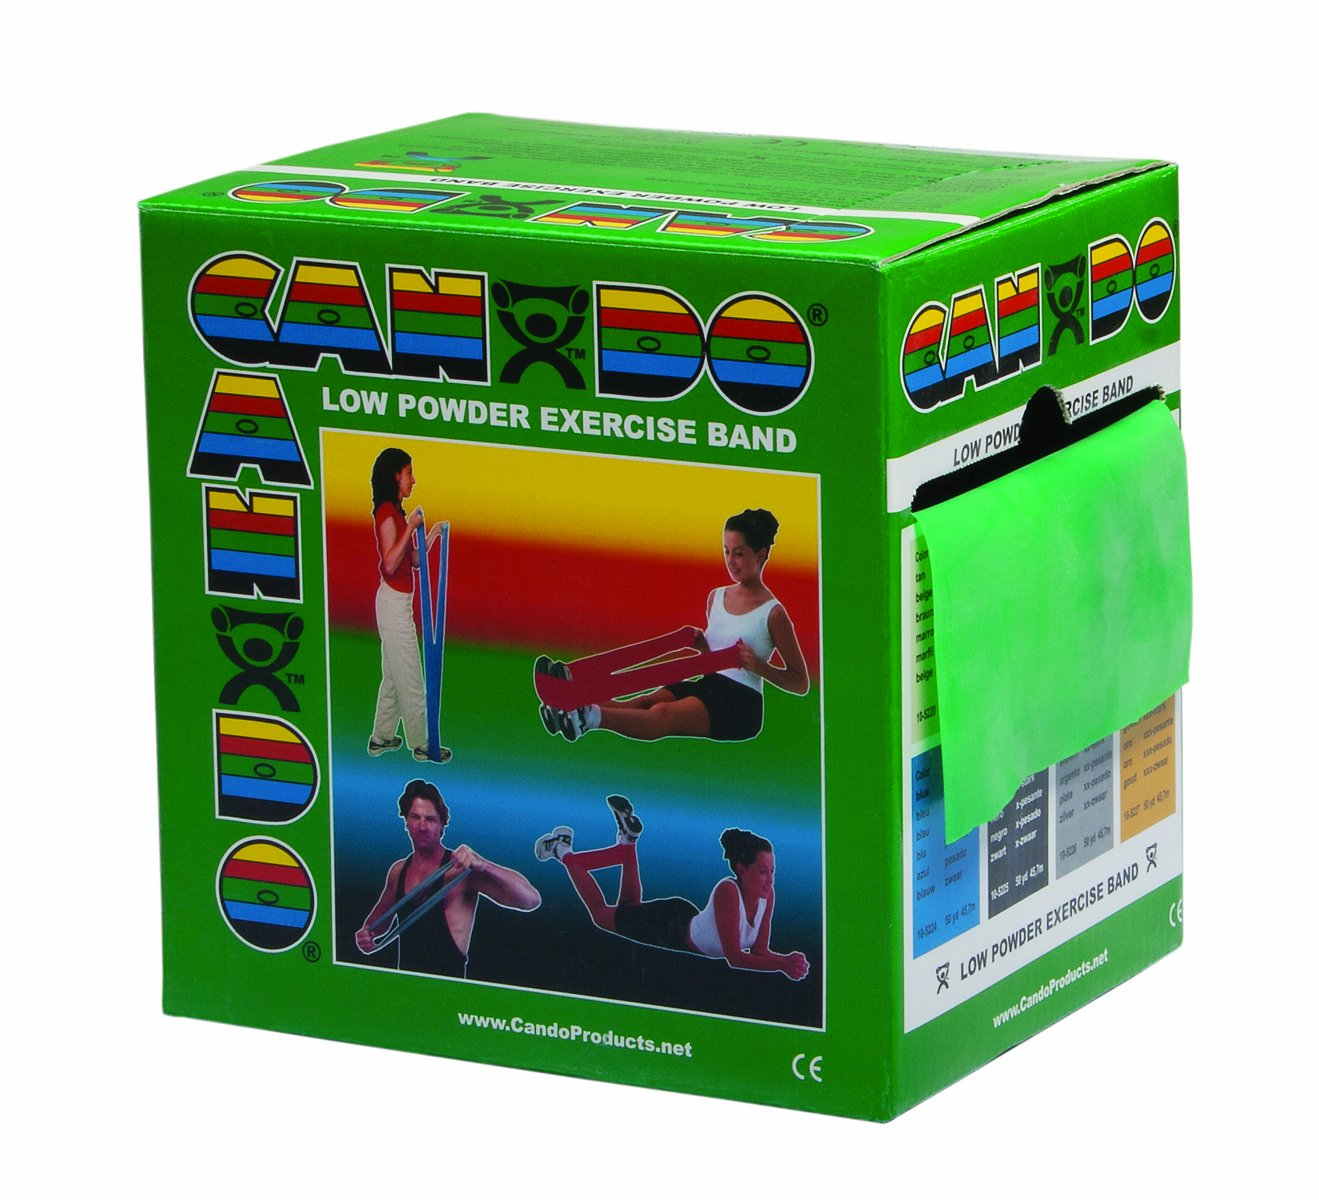 CanDo Low Powder Exercise Band, 50 yard roll, Green: Medium